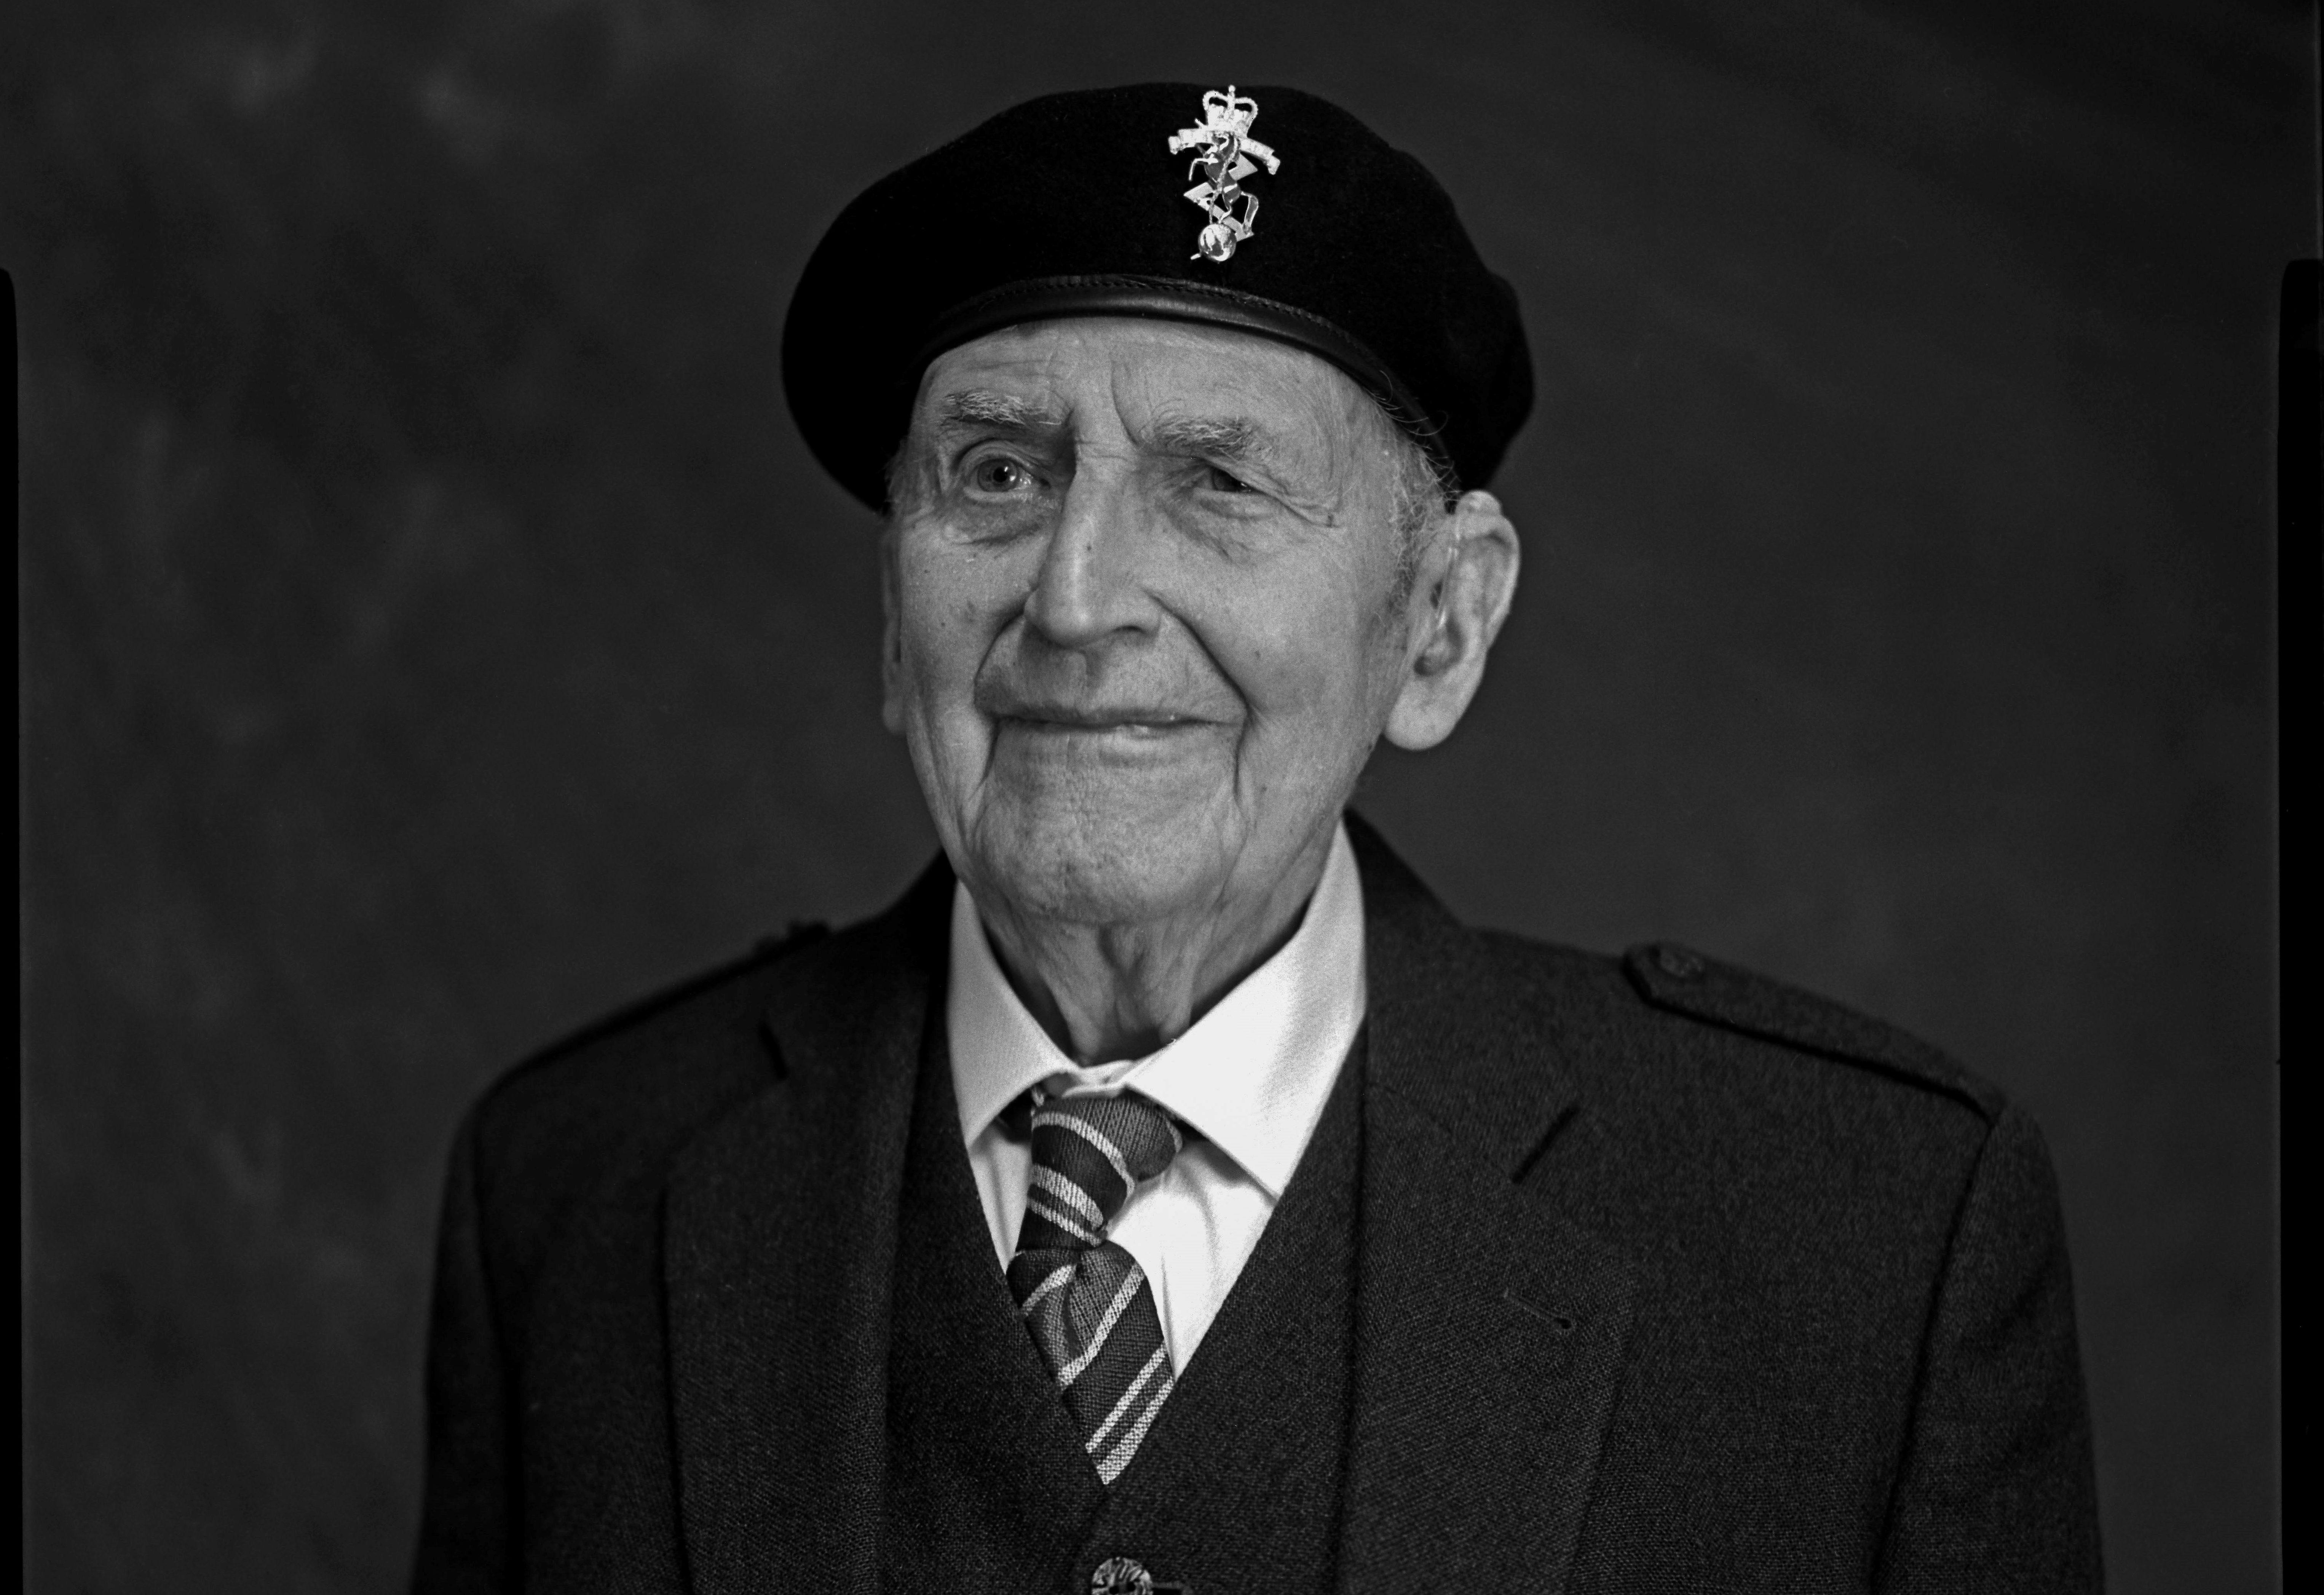 John McOwan, 98, from Peebles,